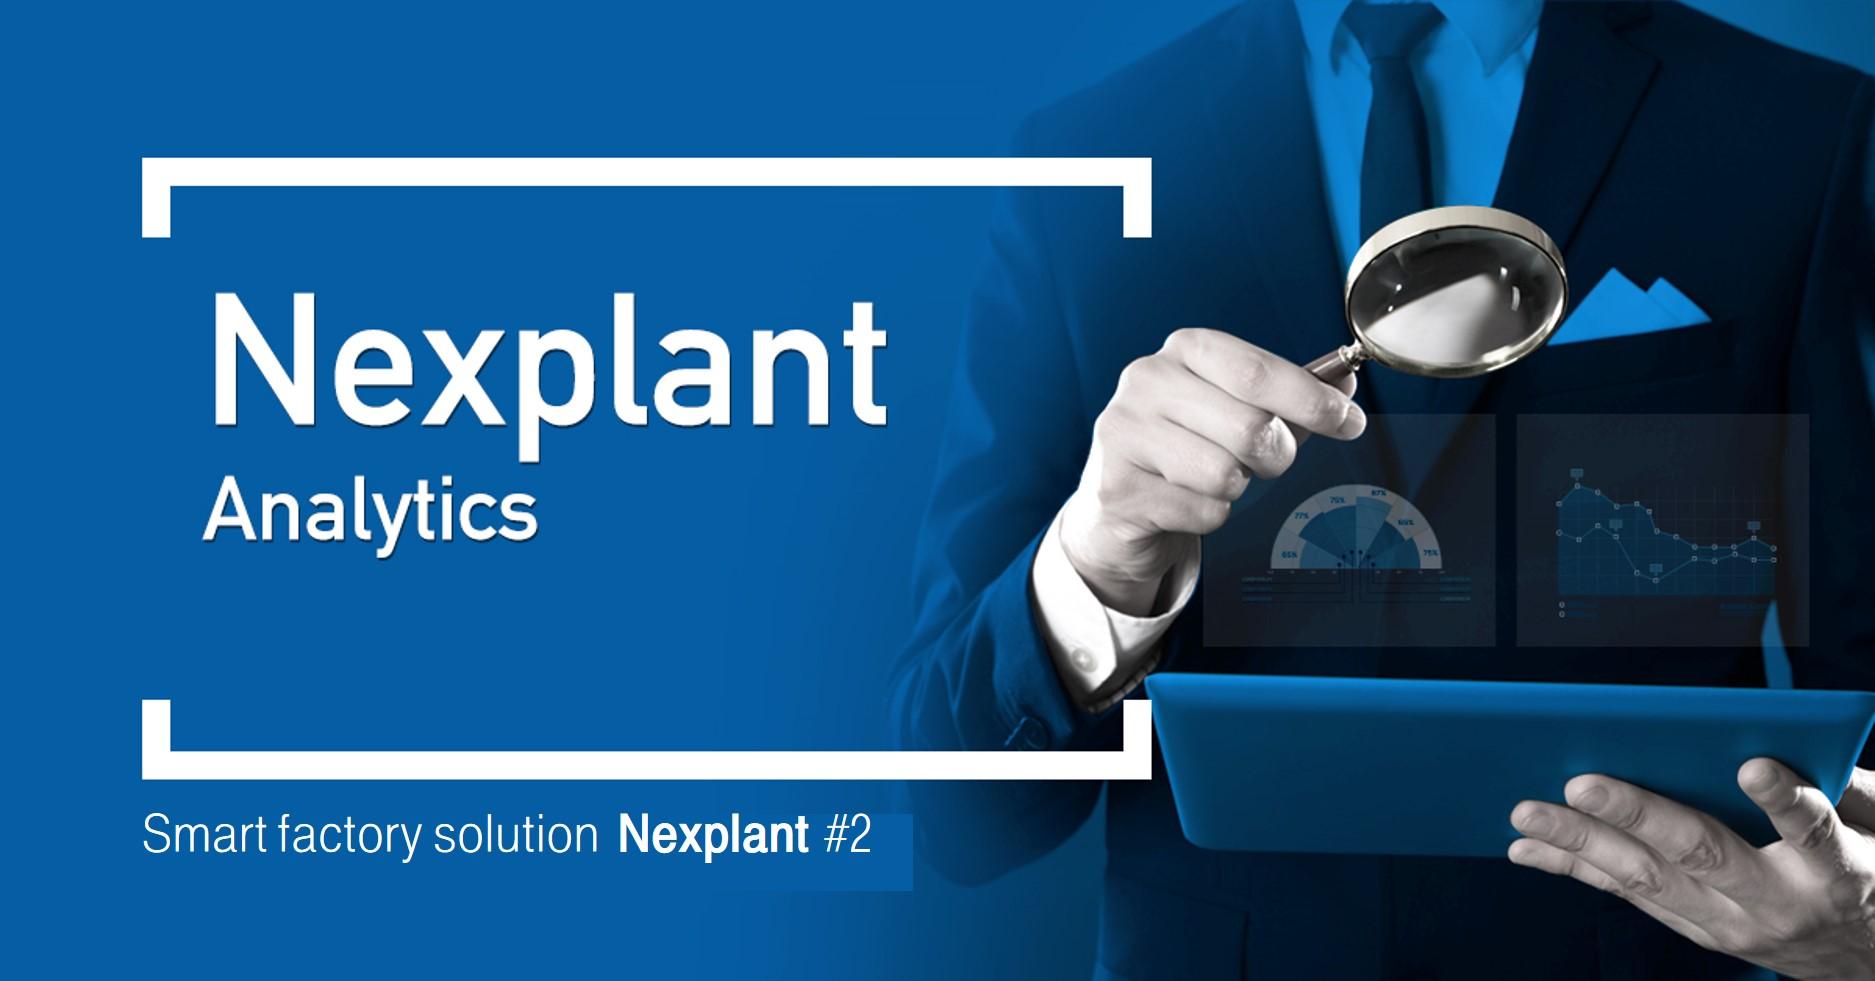 Nexplant Analytics Smart factory solution Nexplant #2